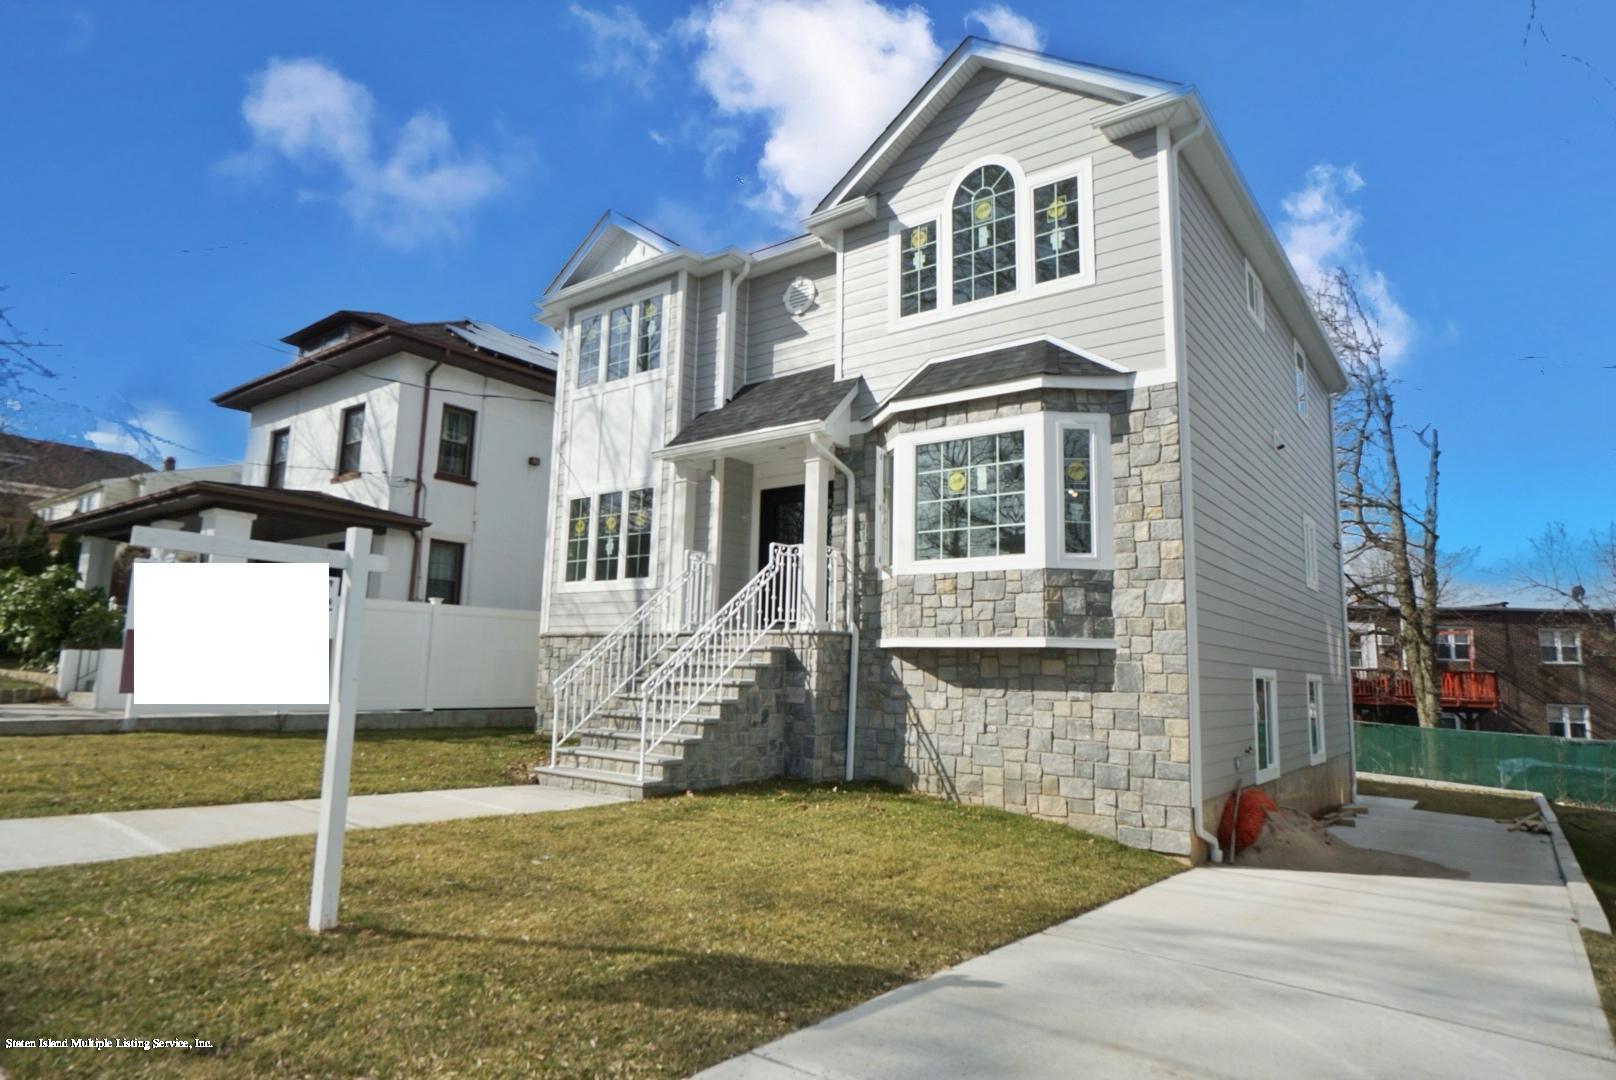 Single Family - Detached 170 Fairview Avenue  Staten Island, NY 10314, MLS-1126684-6